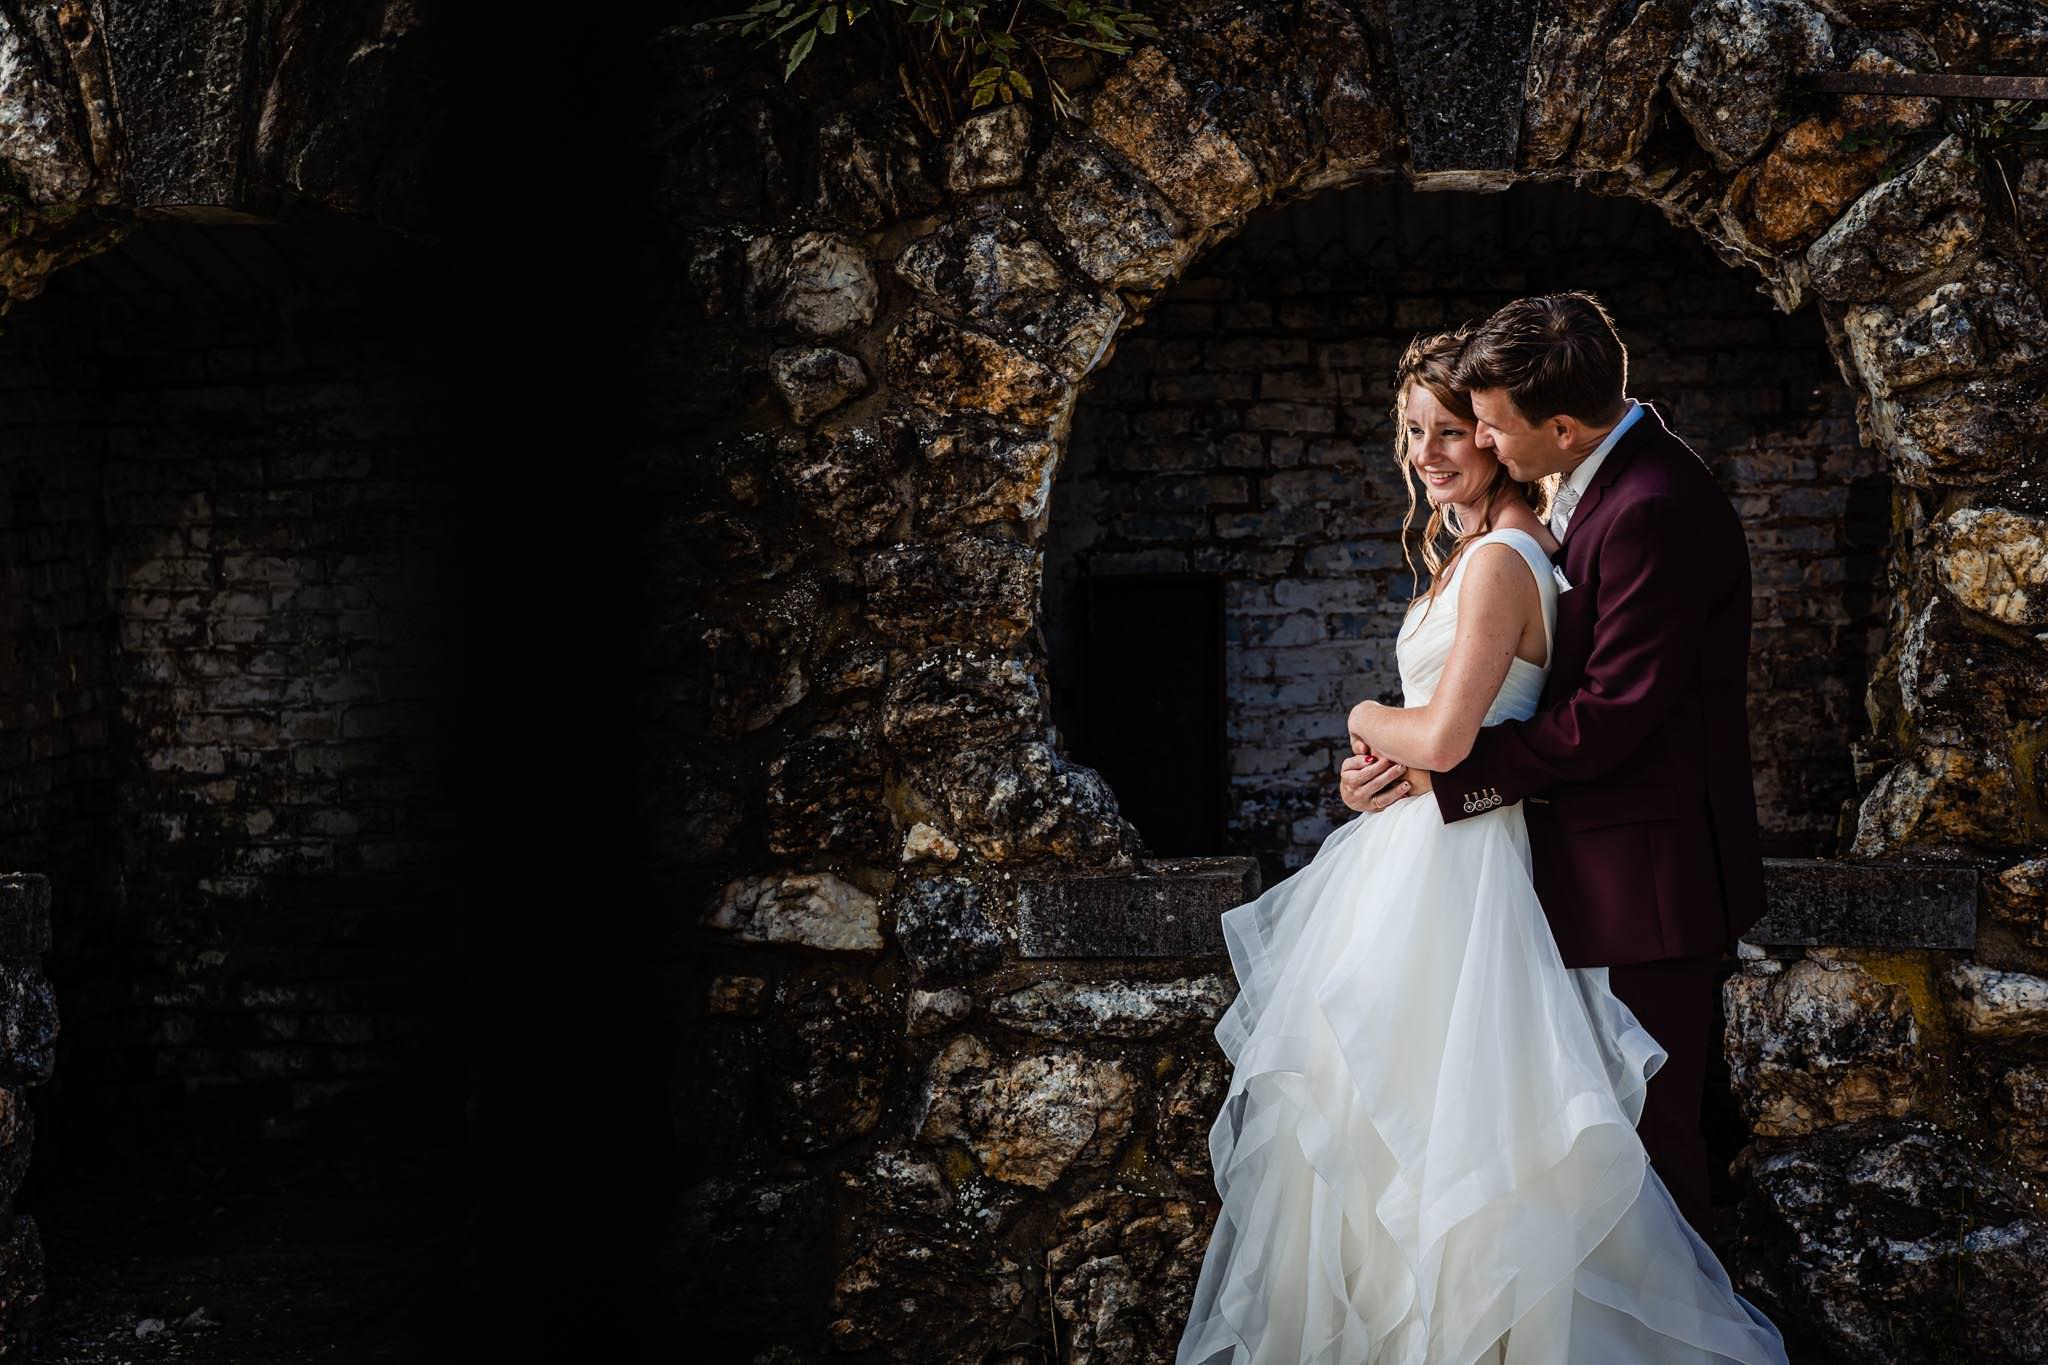 destenation-wedding-belgium-belgie-robert-jan-kelly-chateau-magmod-canonr6-bruidsfotograaf-bruidsfotografie-doetinchem-nijmegen